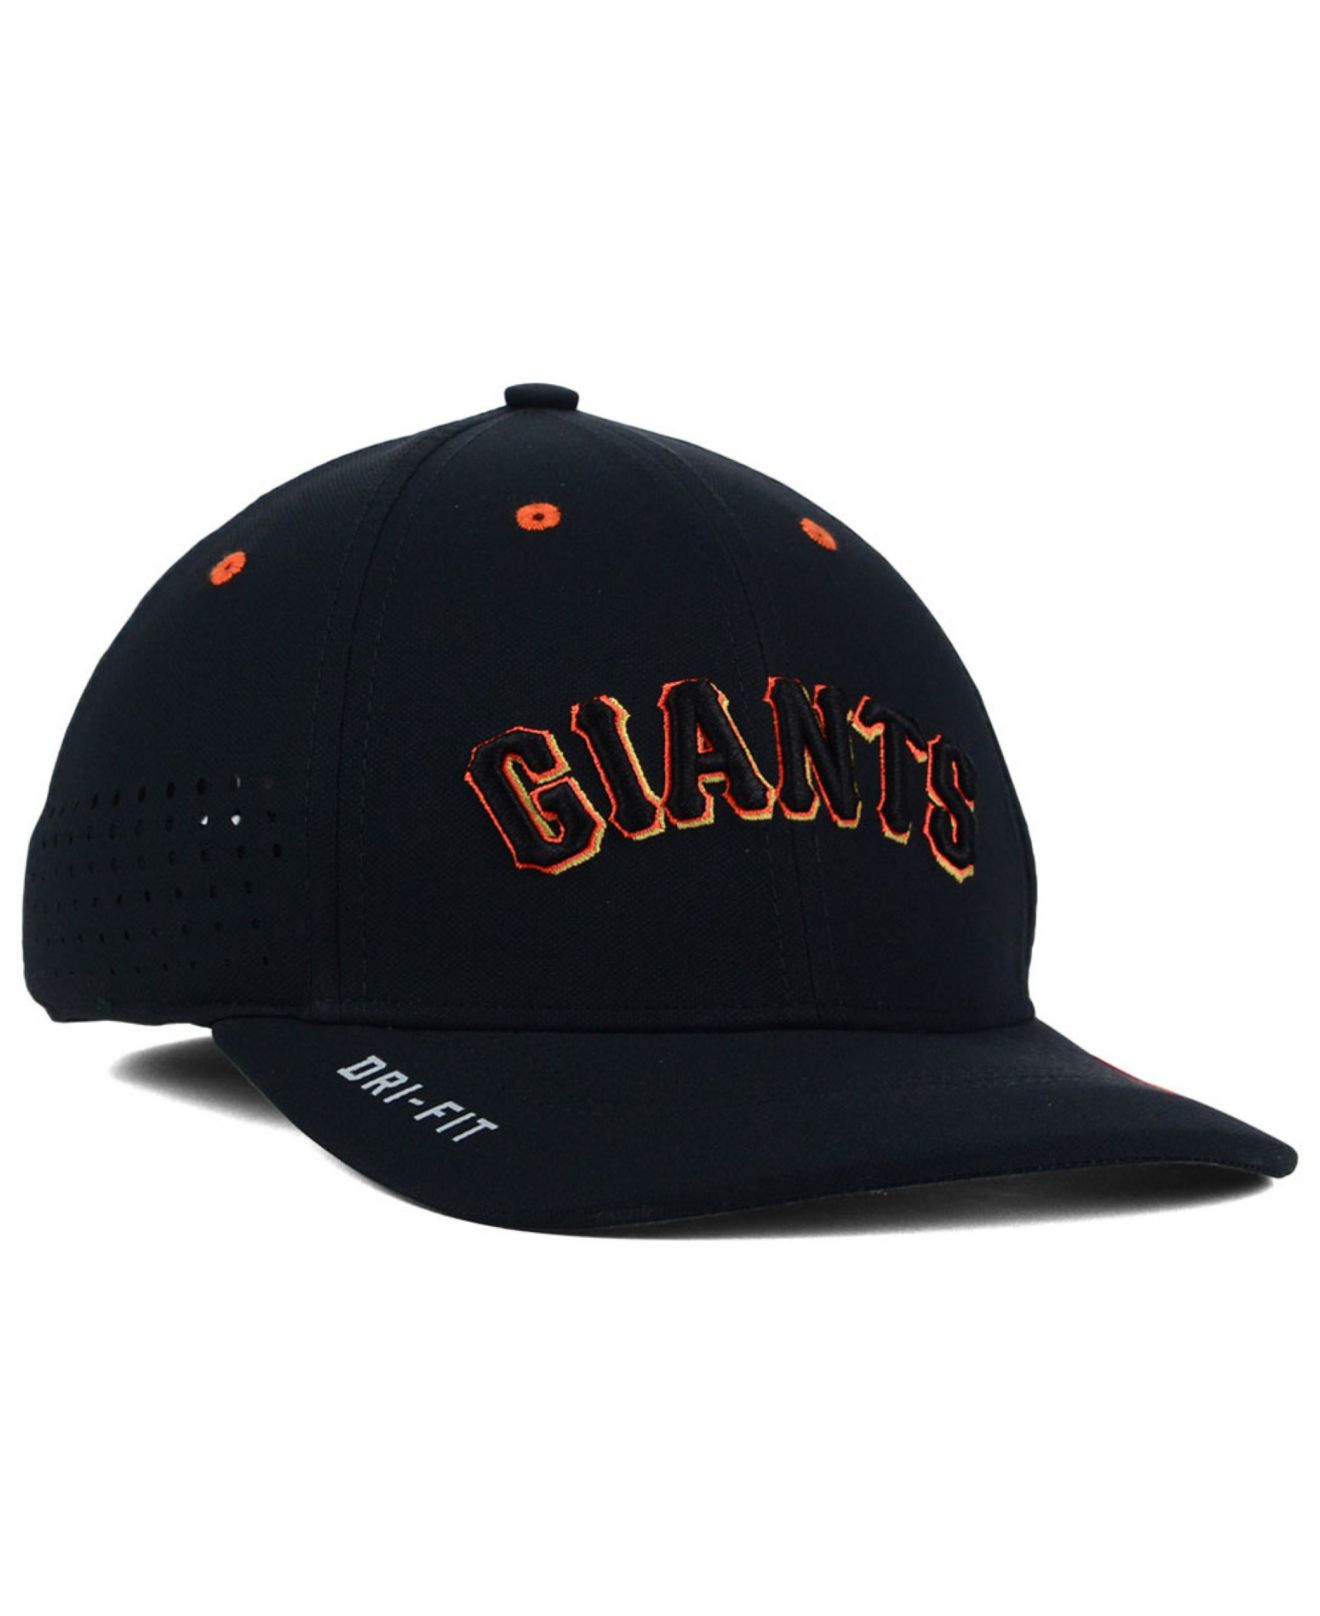 bd1dd98f0b1a9 ... new zealand lyst nike san francisco giants vapor swoosh flex cap in  black for men 942d7